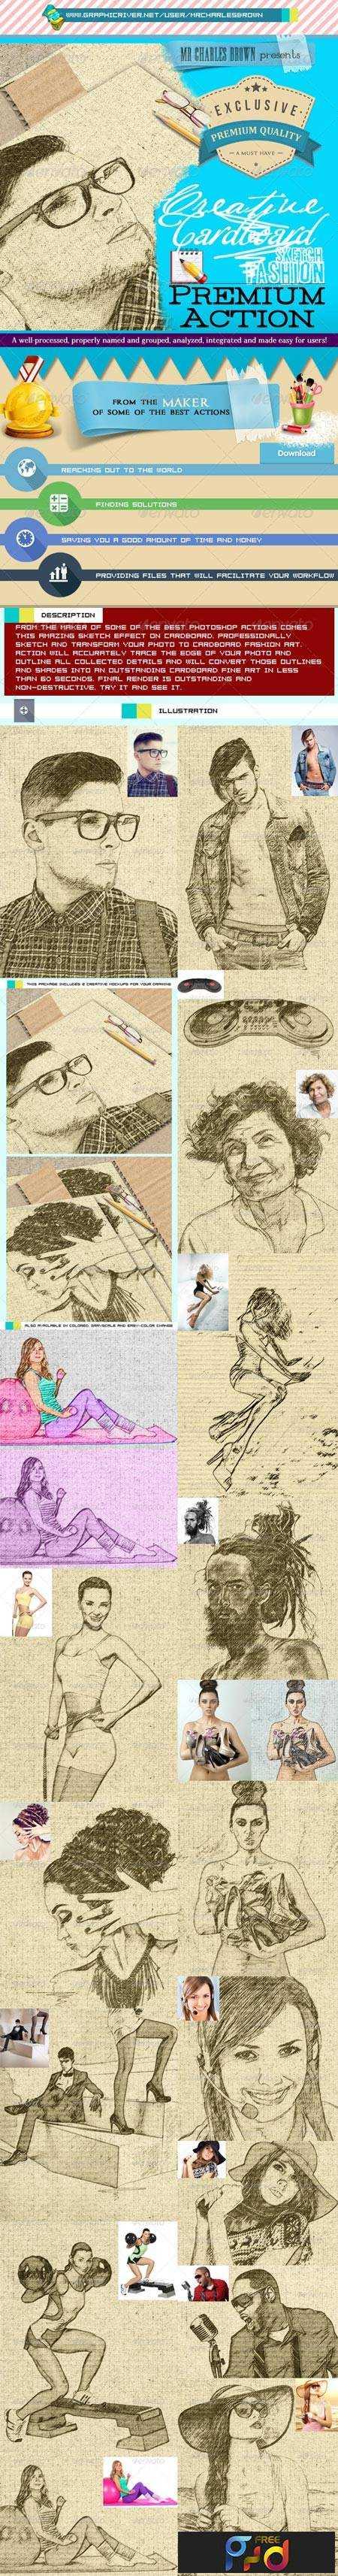 FreePsdVn.com_1702091_PHOTOSHOP_creative_cardboard_fashion_sketch_6237991